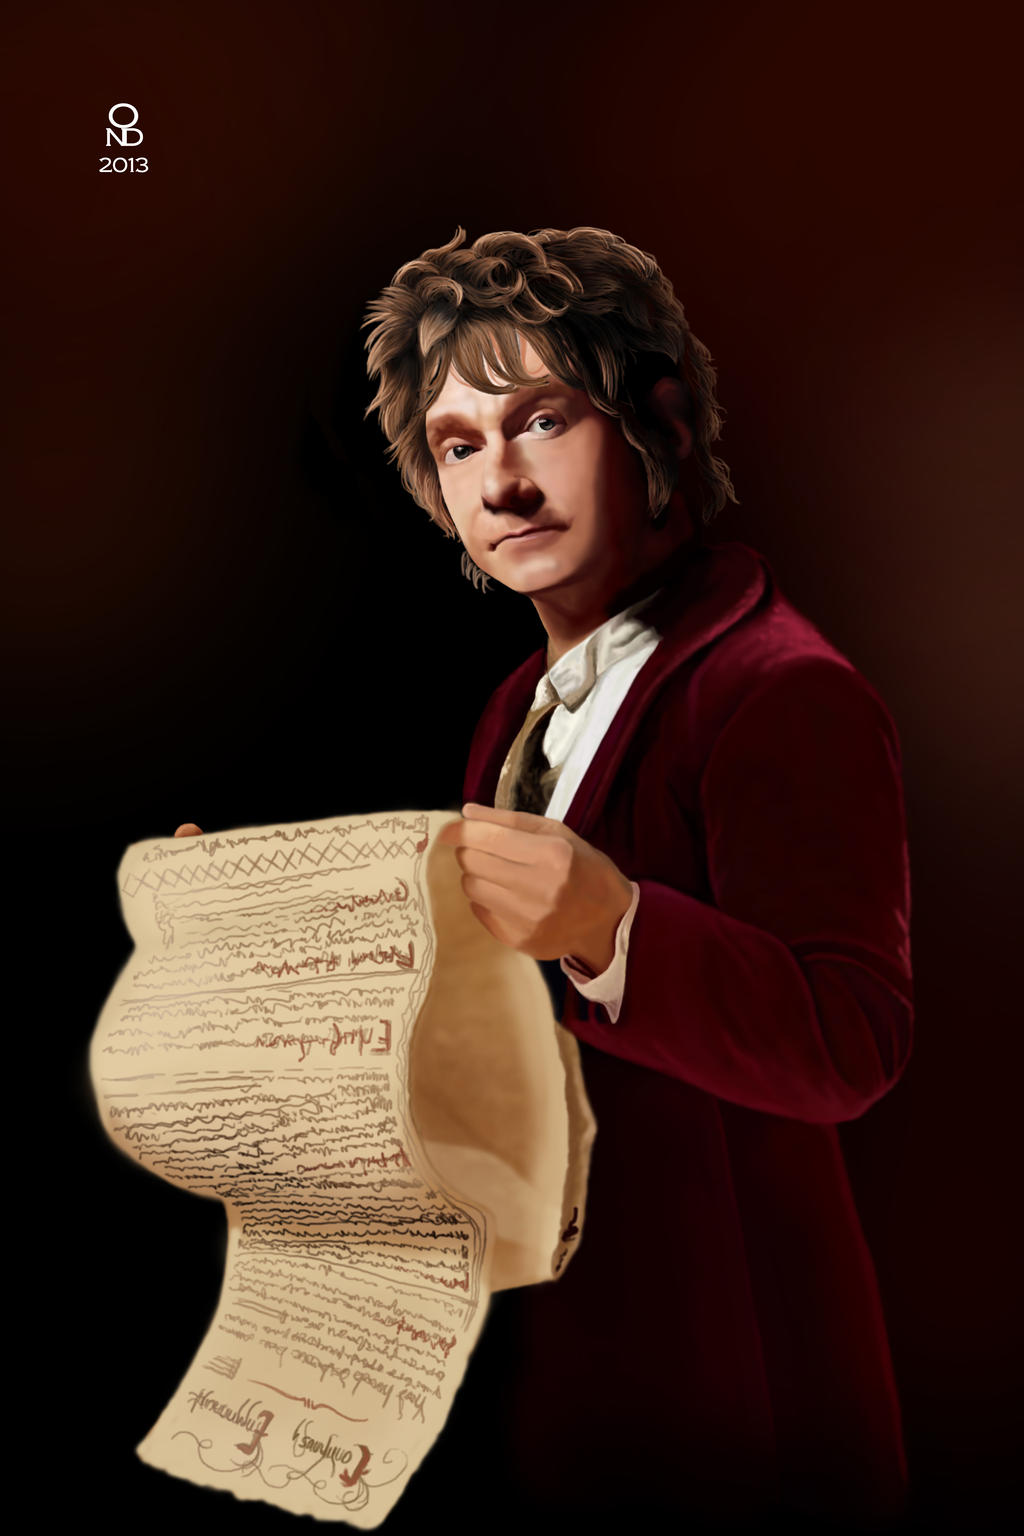 A burglar you said? - Bilbo Baggins by Ondjage